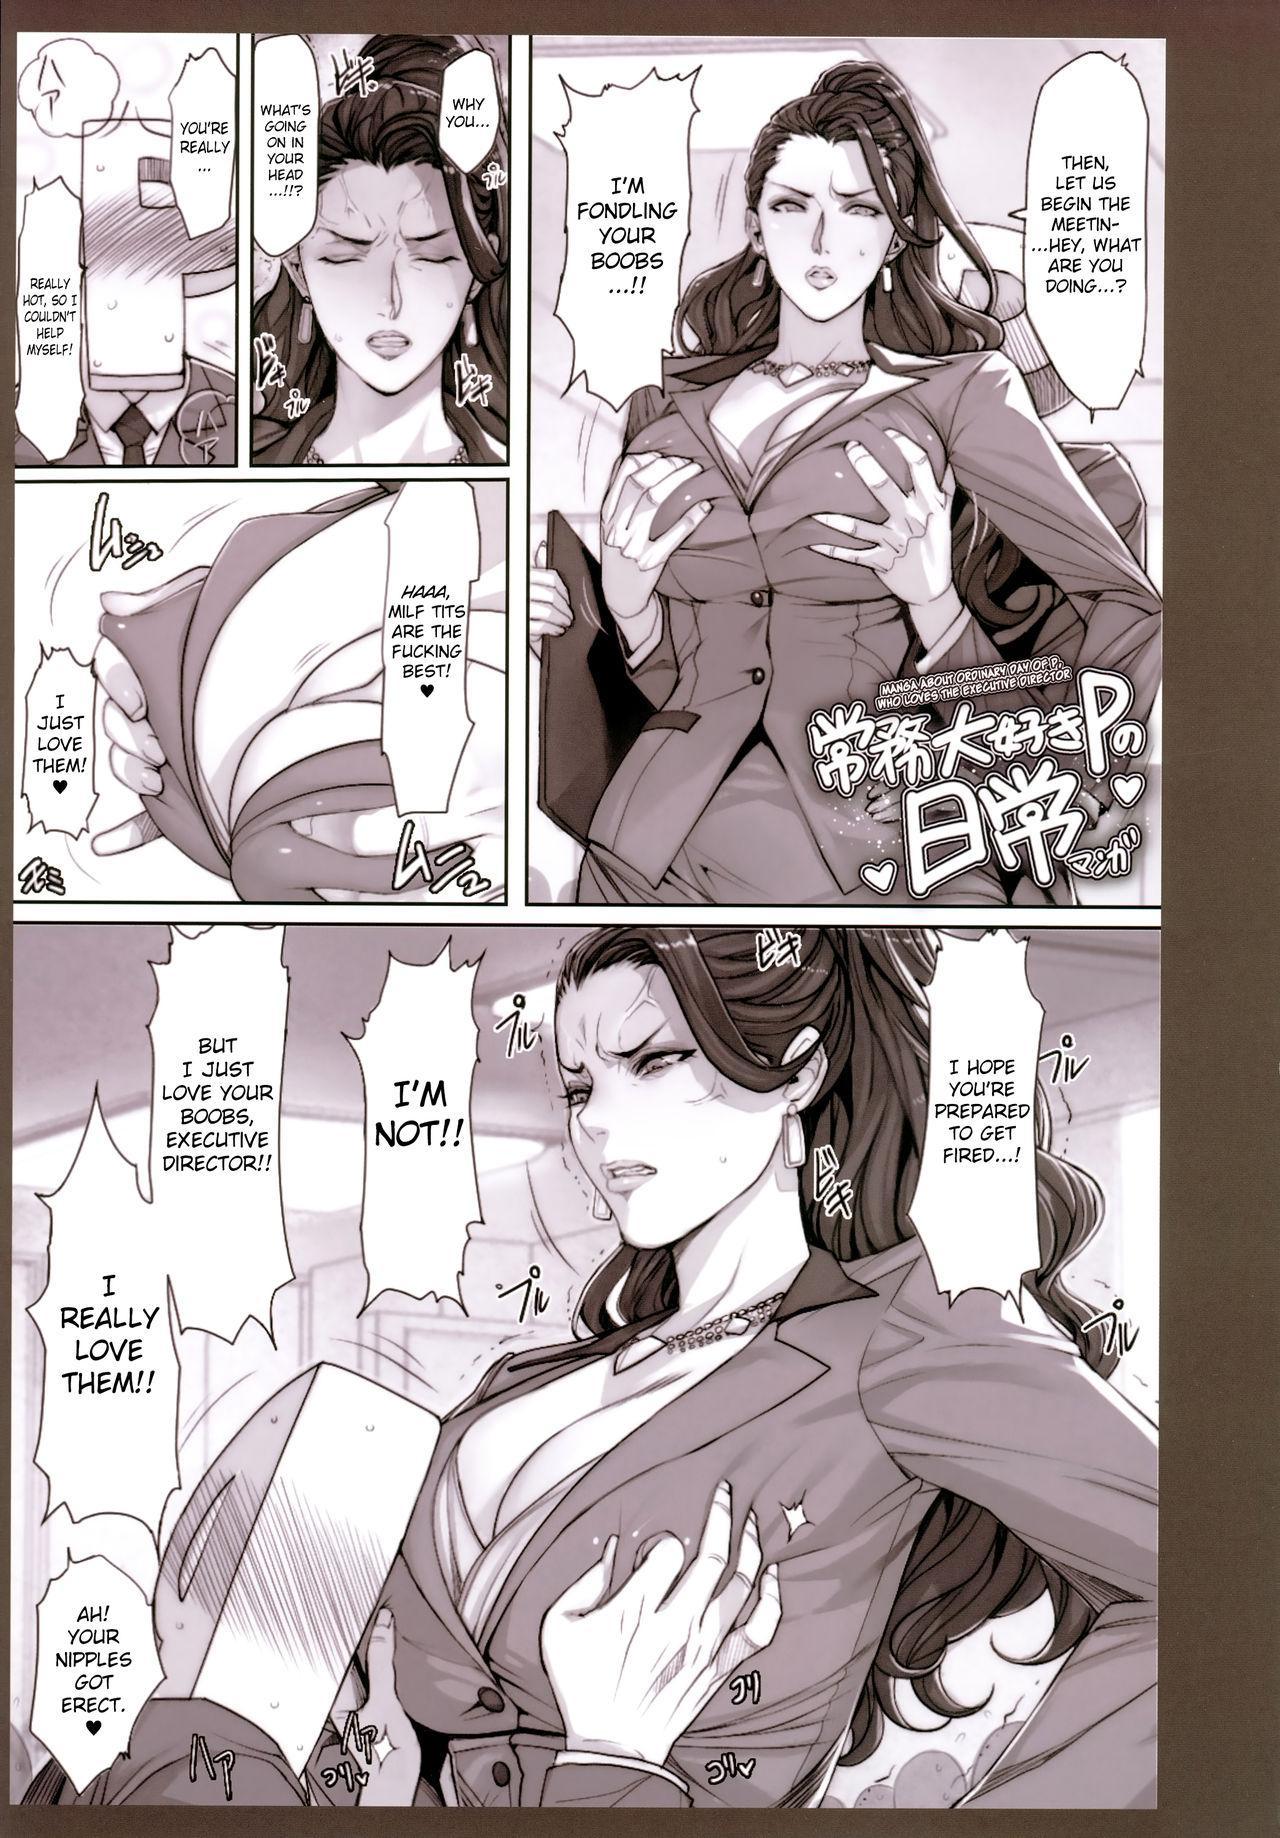 H na Toshiue Chara no Rakugaki - Rough Manga Hon | A Collection of Sketches and Rough Manga of Hot MILFs 11